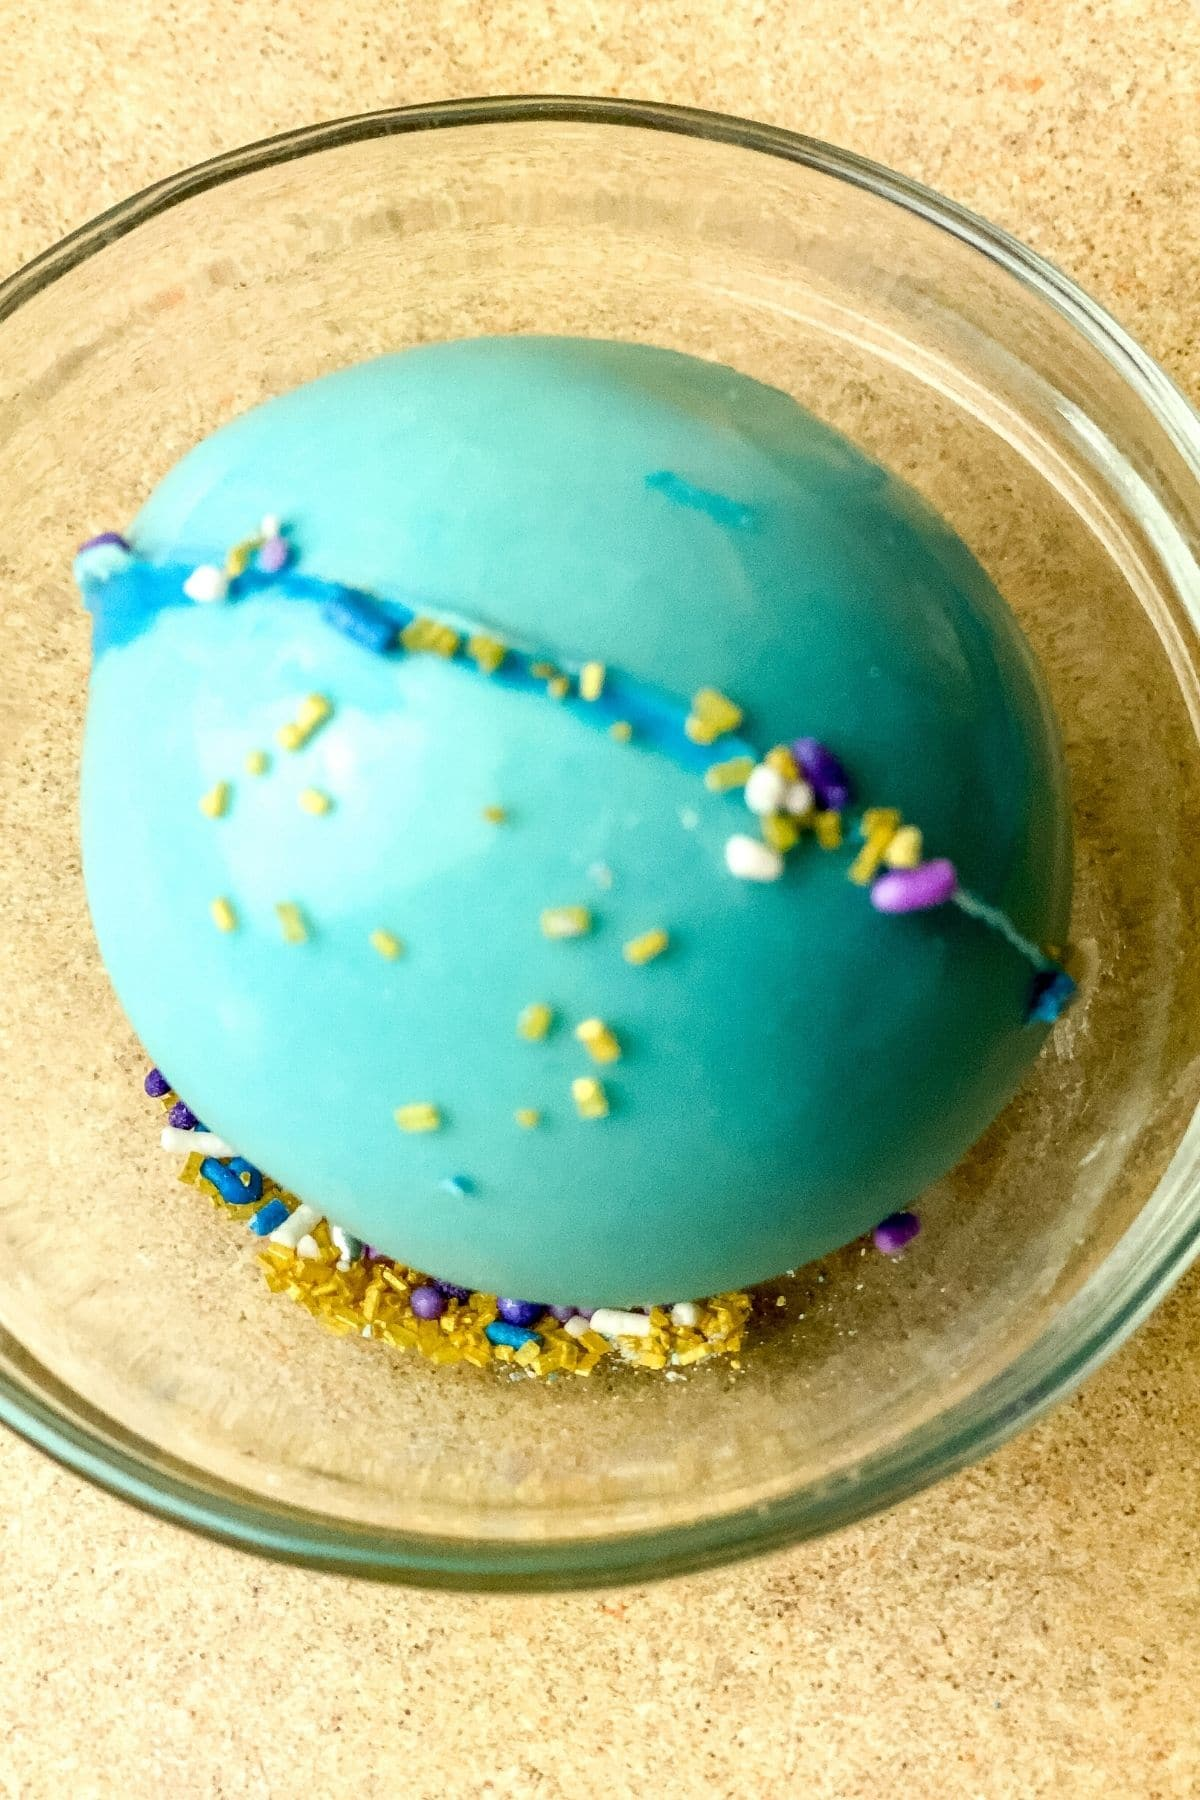 Adding sprinkles to unicorn hot cocoa bomb